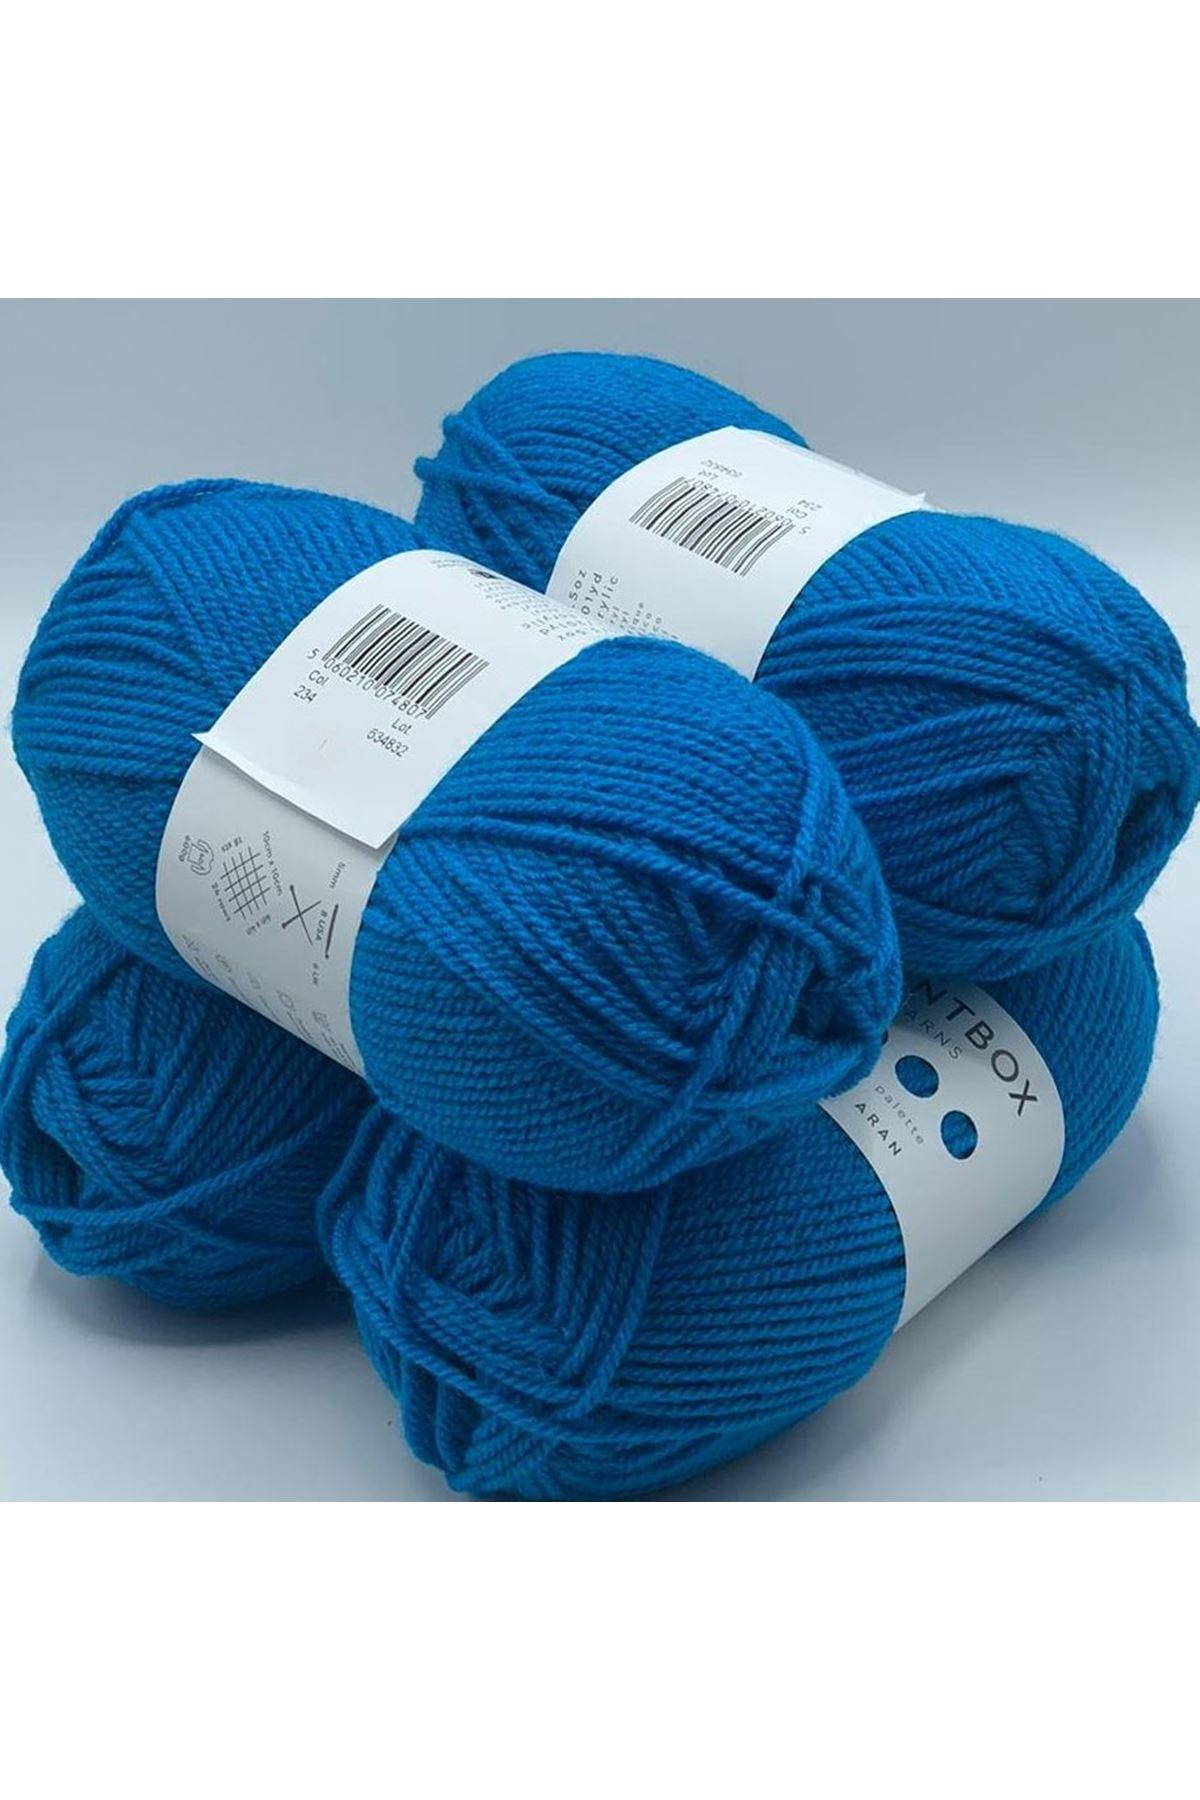 İhrac Fazlası 118 Orijinal Paintbox Simply DK 4'lü Paket Mavi